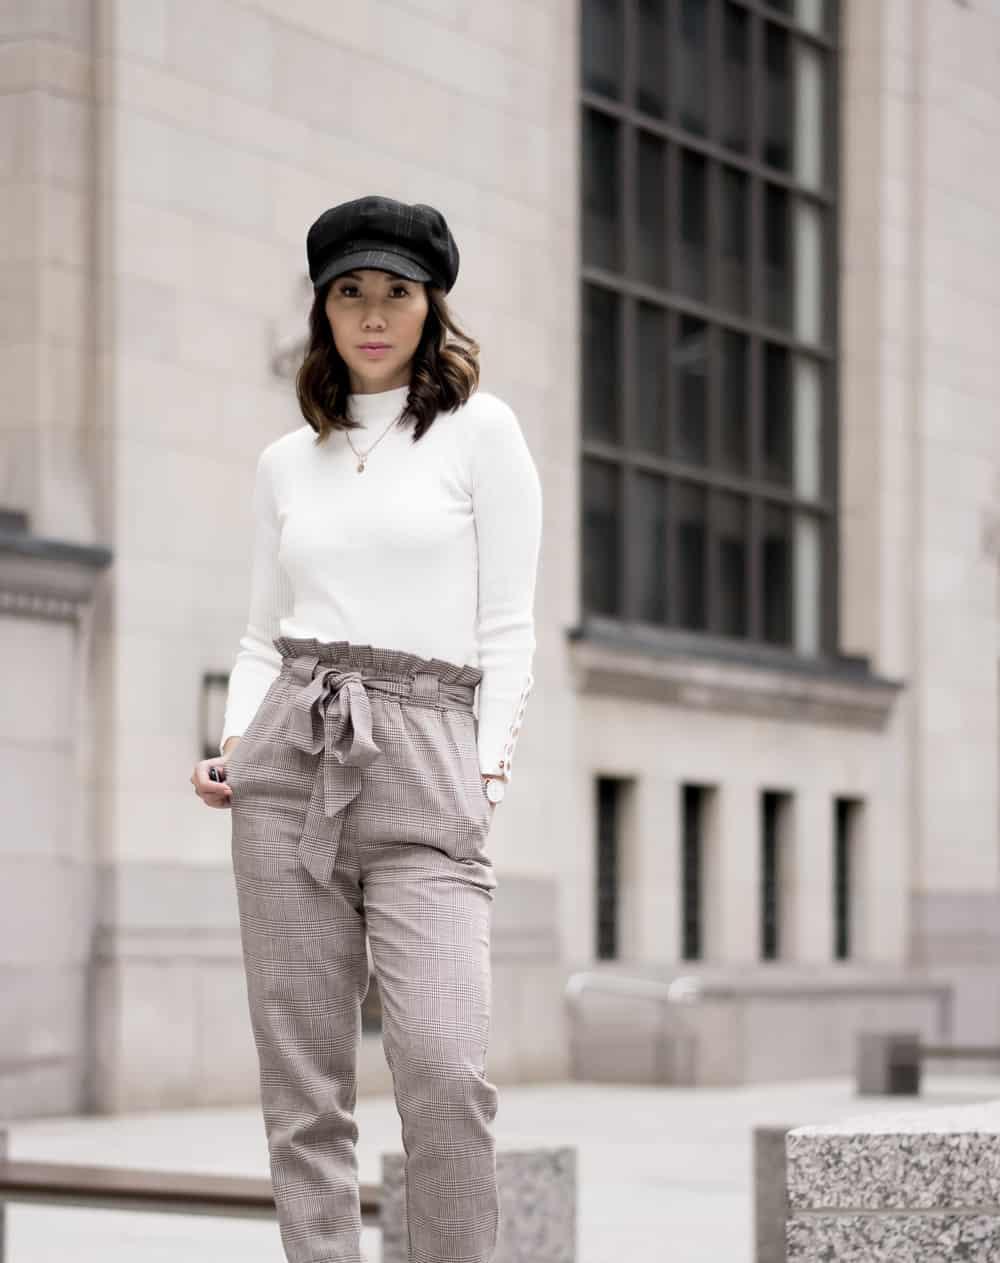 #OOTD look - plaid pants, white sweater newsboy cap, downtown Toronto